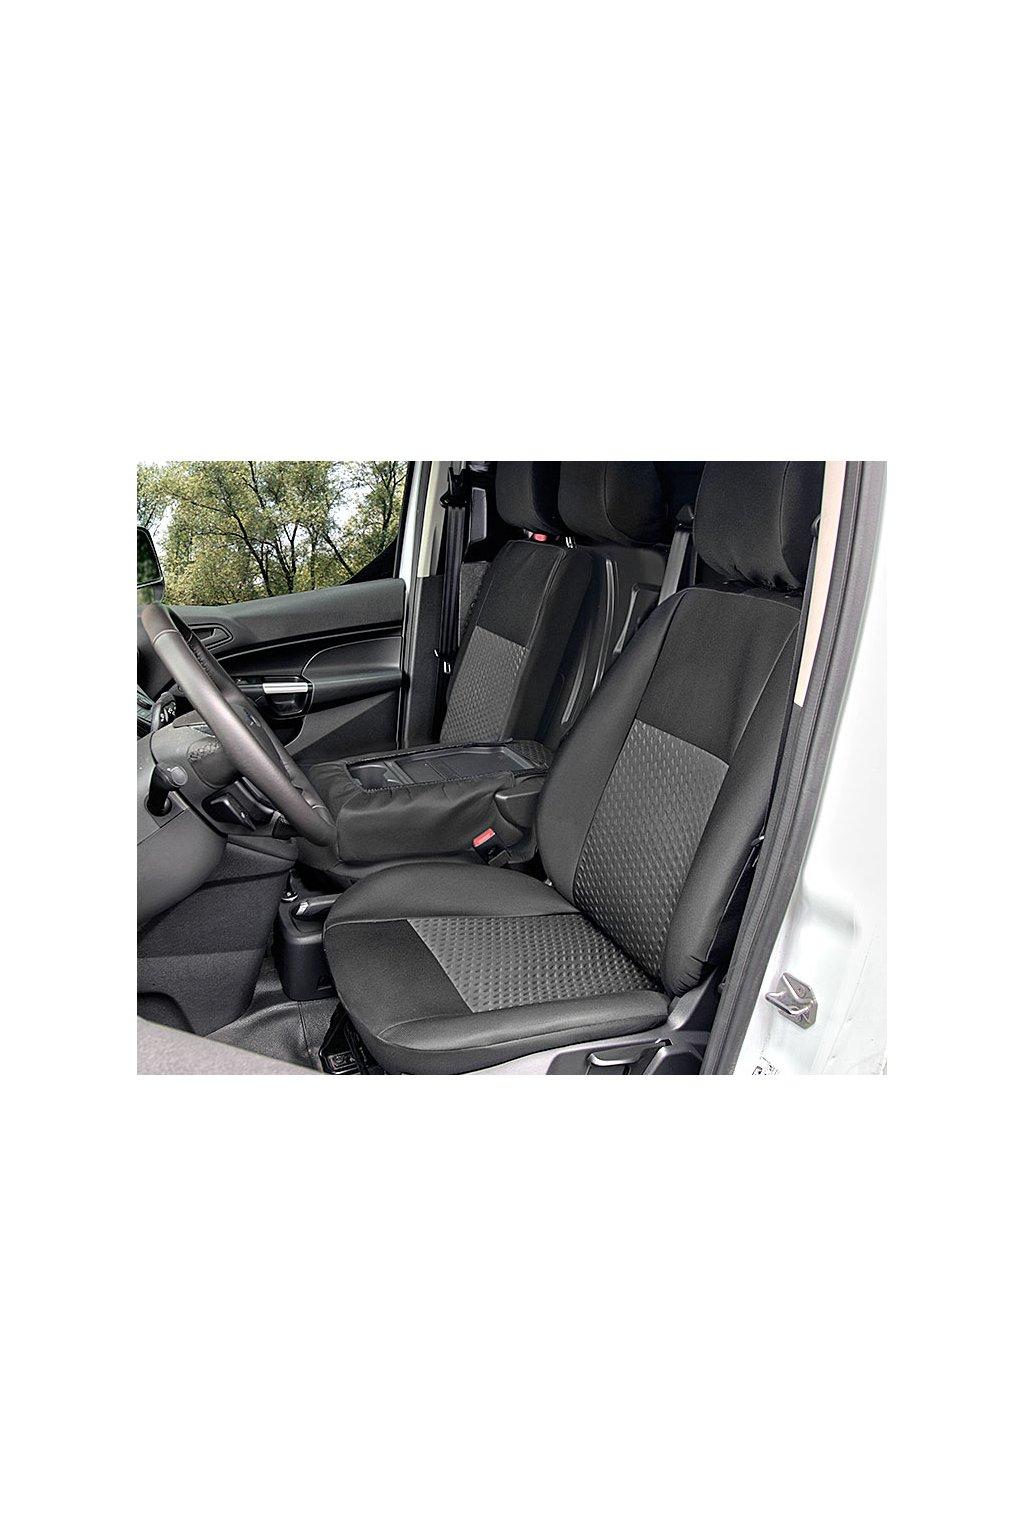 "AUTOPOTAH ""KEGEL"" Ford Transit Connect II van od 2014 TAILORE MADE CERNO-SEDY SADA 6 KS"